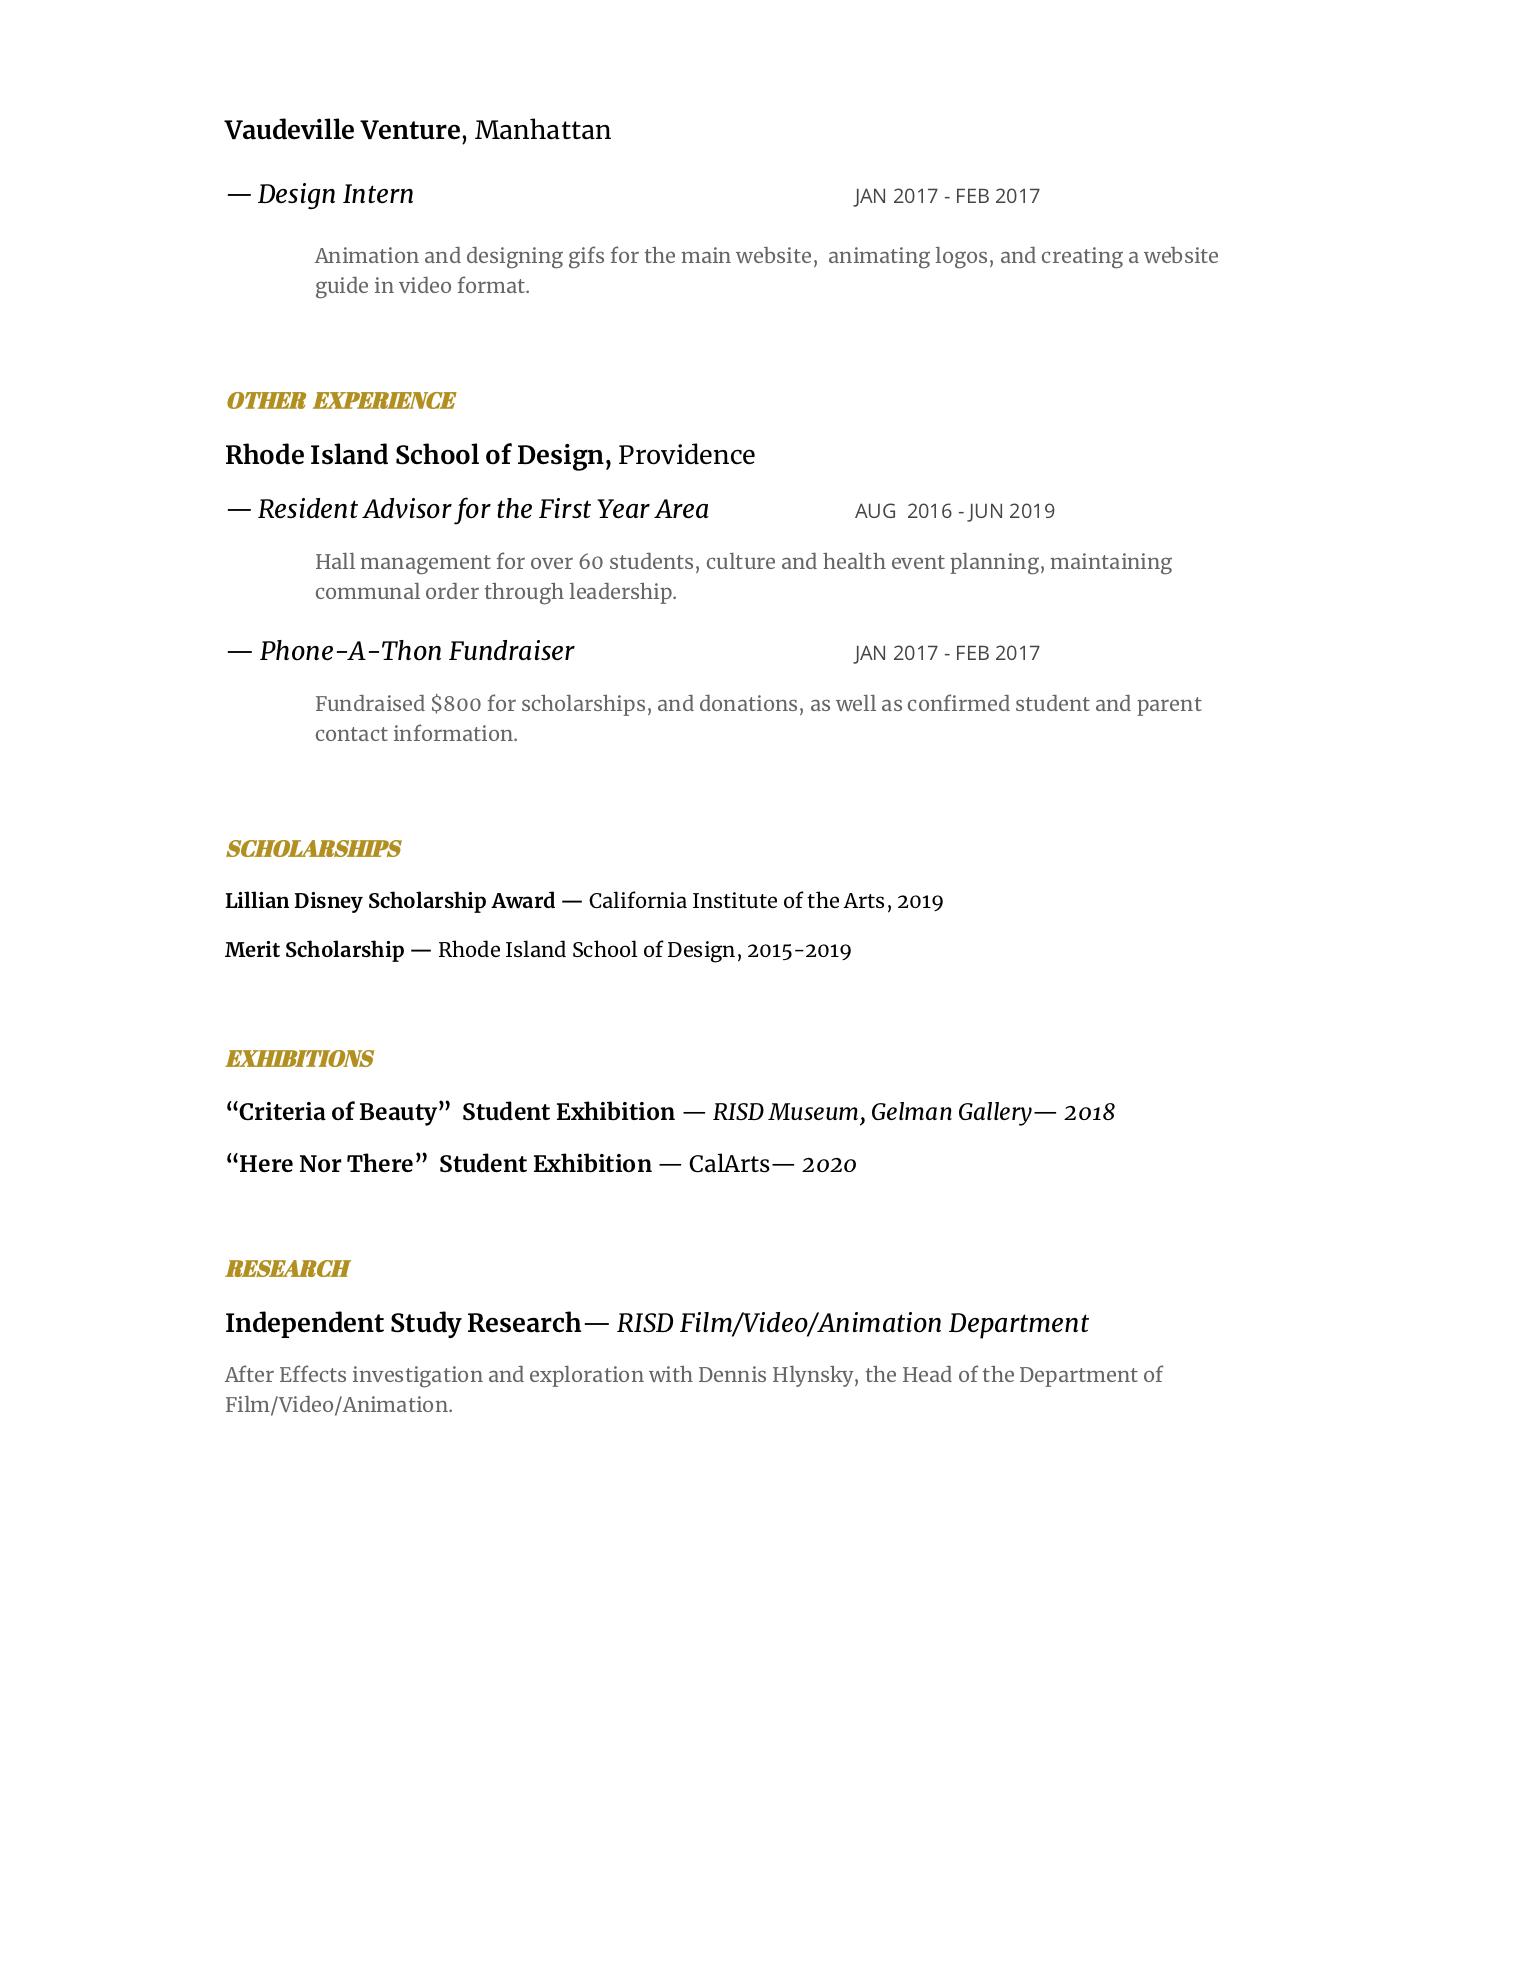 Dairys-Escoto-Resume-2020-2-1